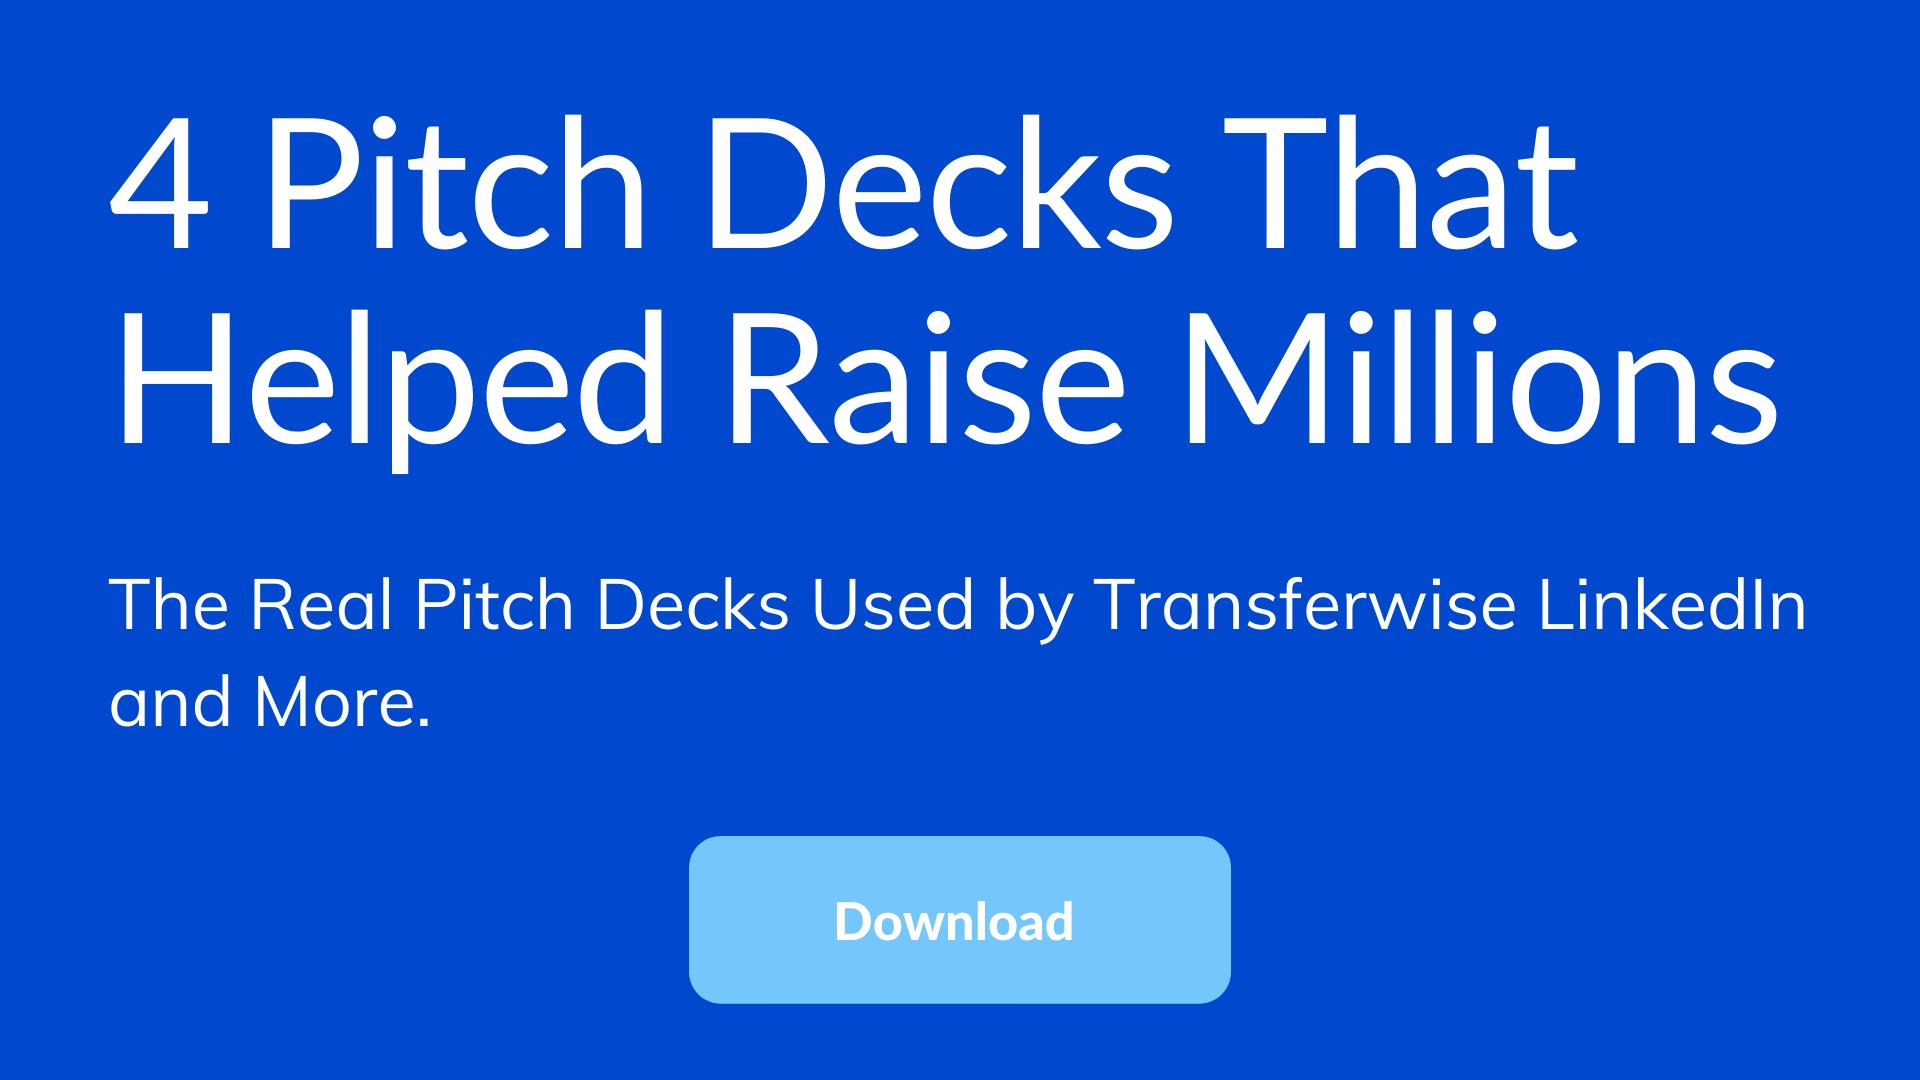 4 Pitch Decks That Helped Raise Millions - Altar.io